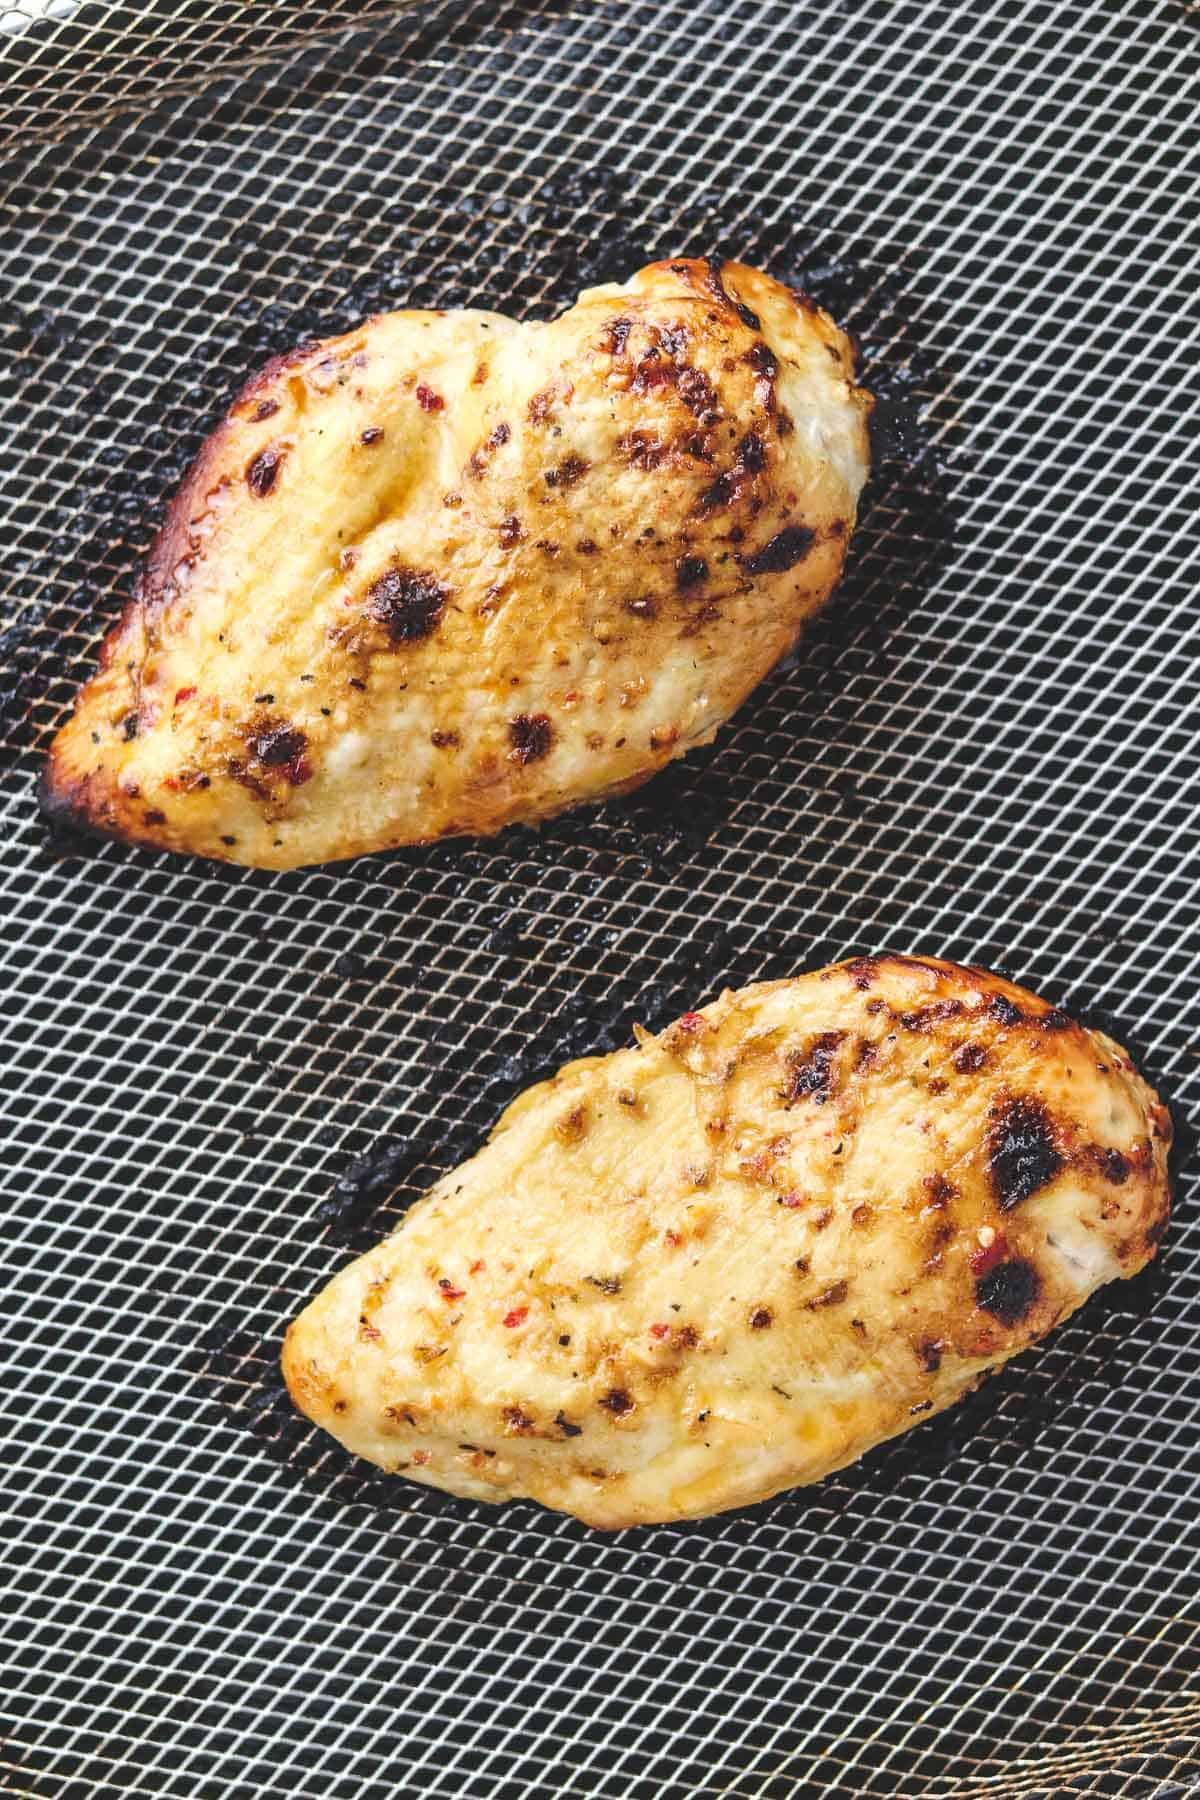 Italian chicken breasts in air fryer basket